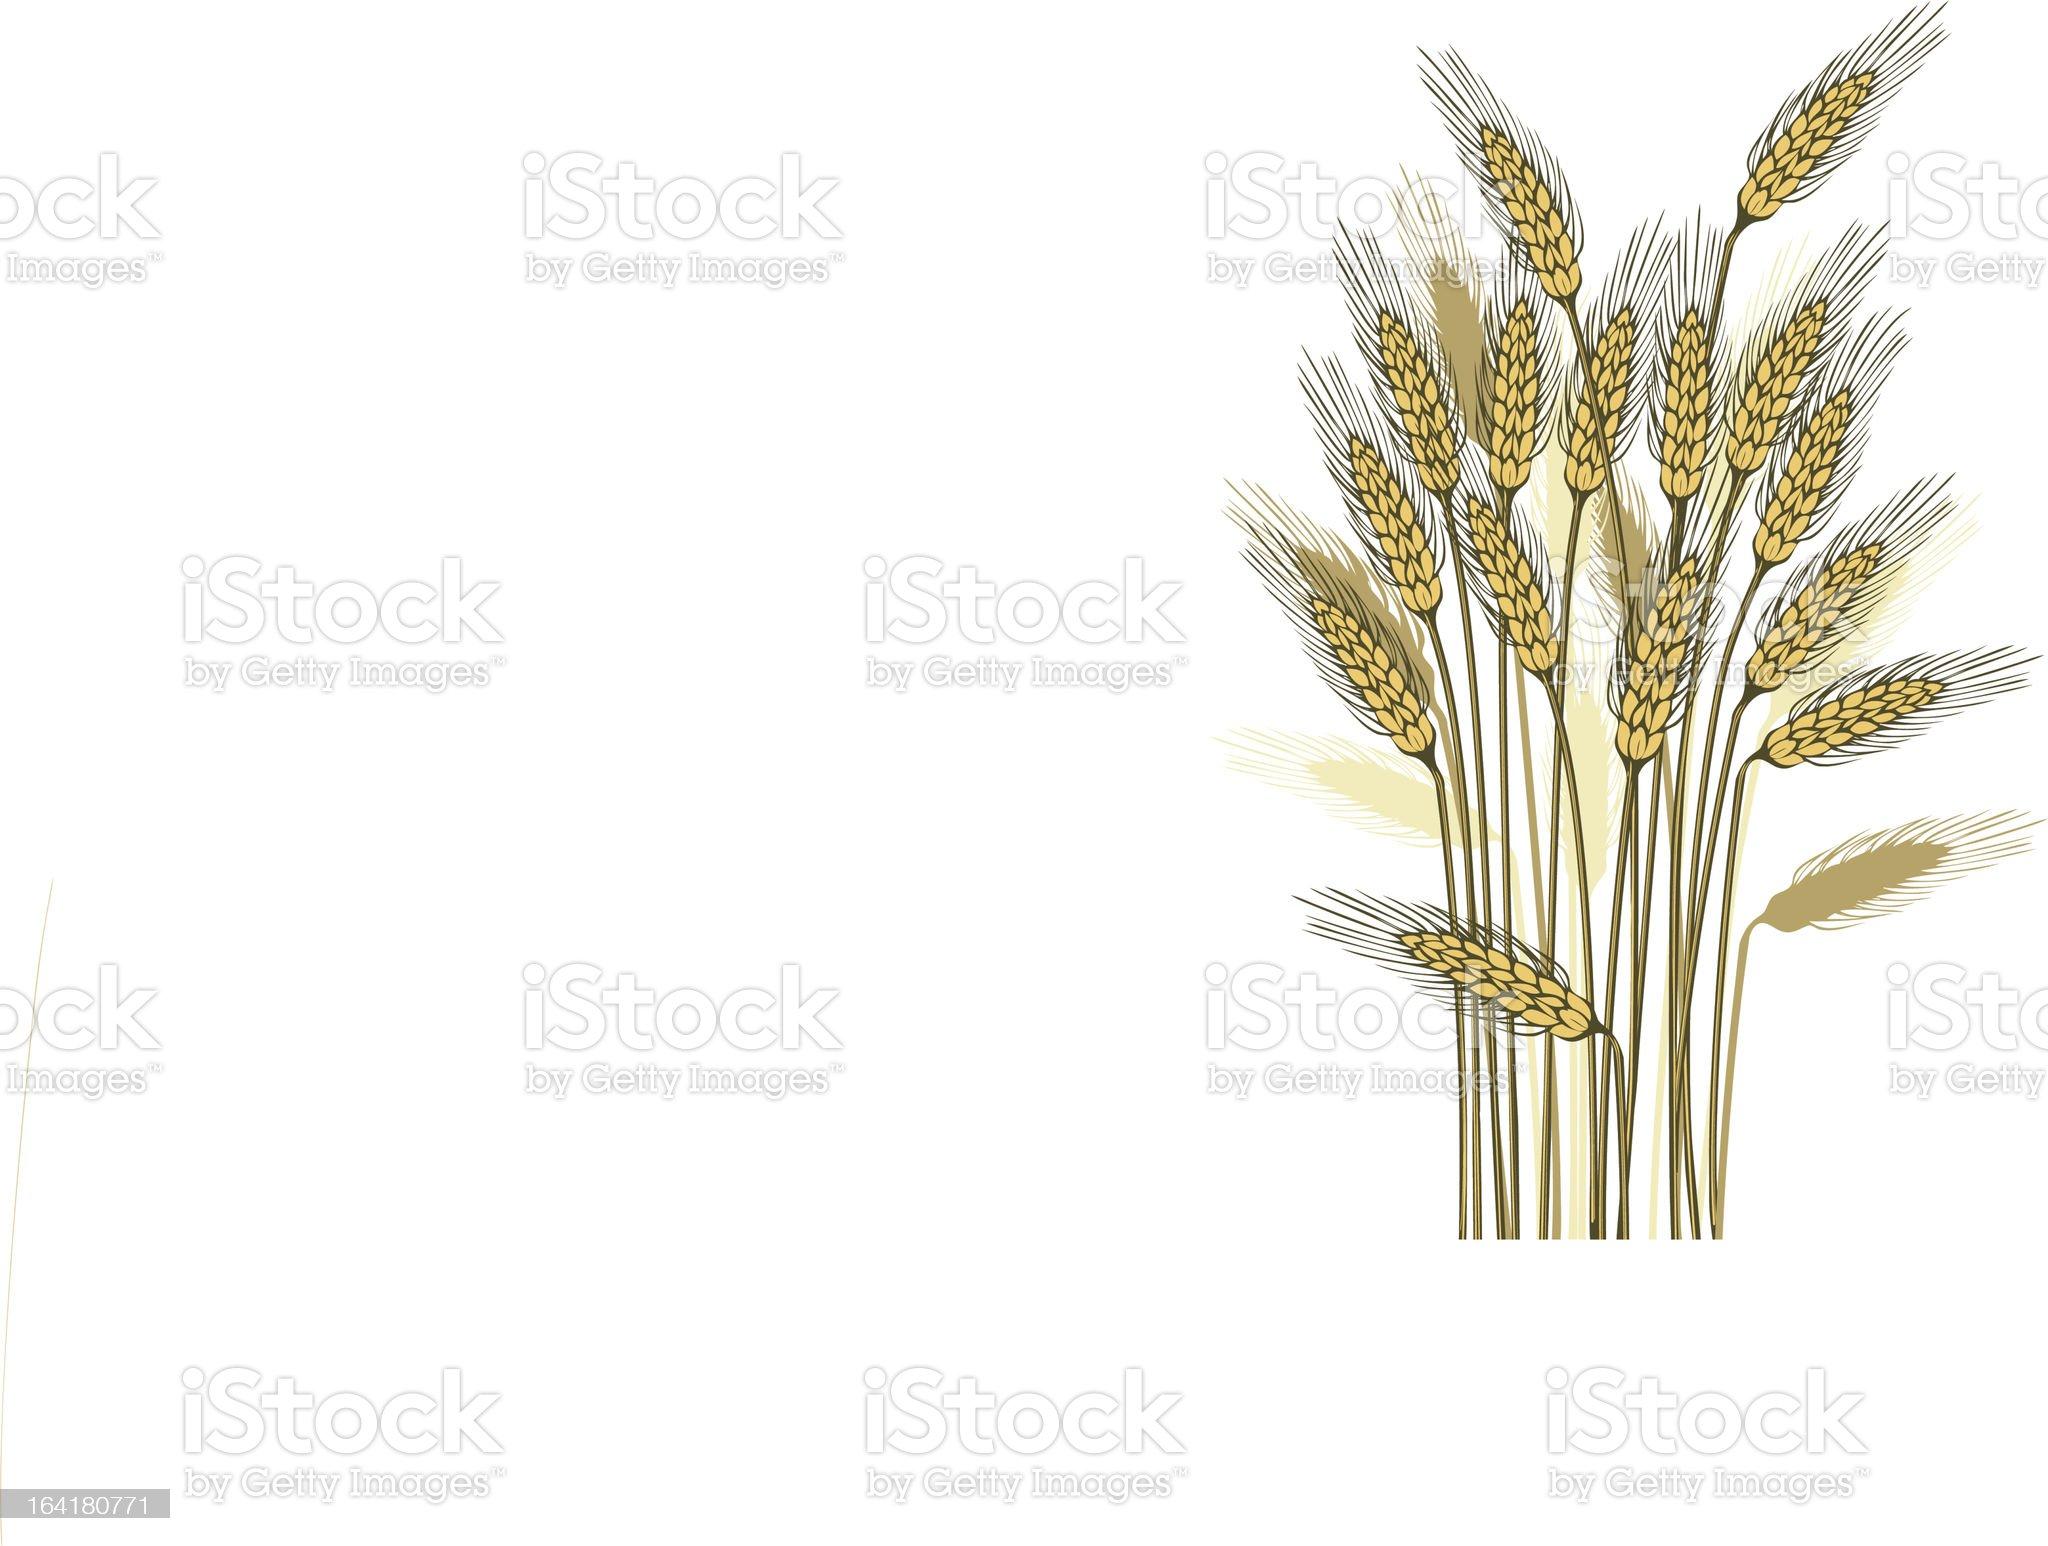 Wheat harvest royalty-free stock vector art